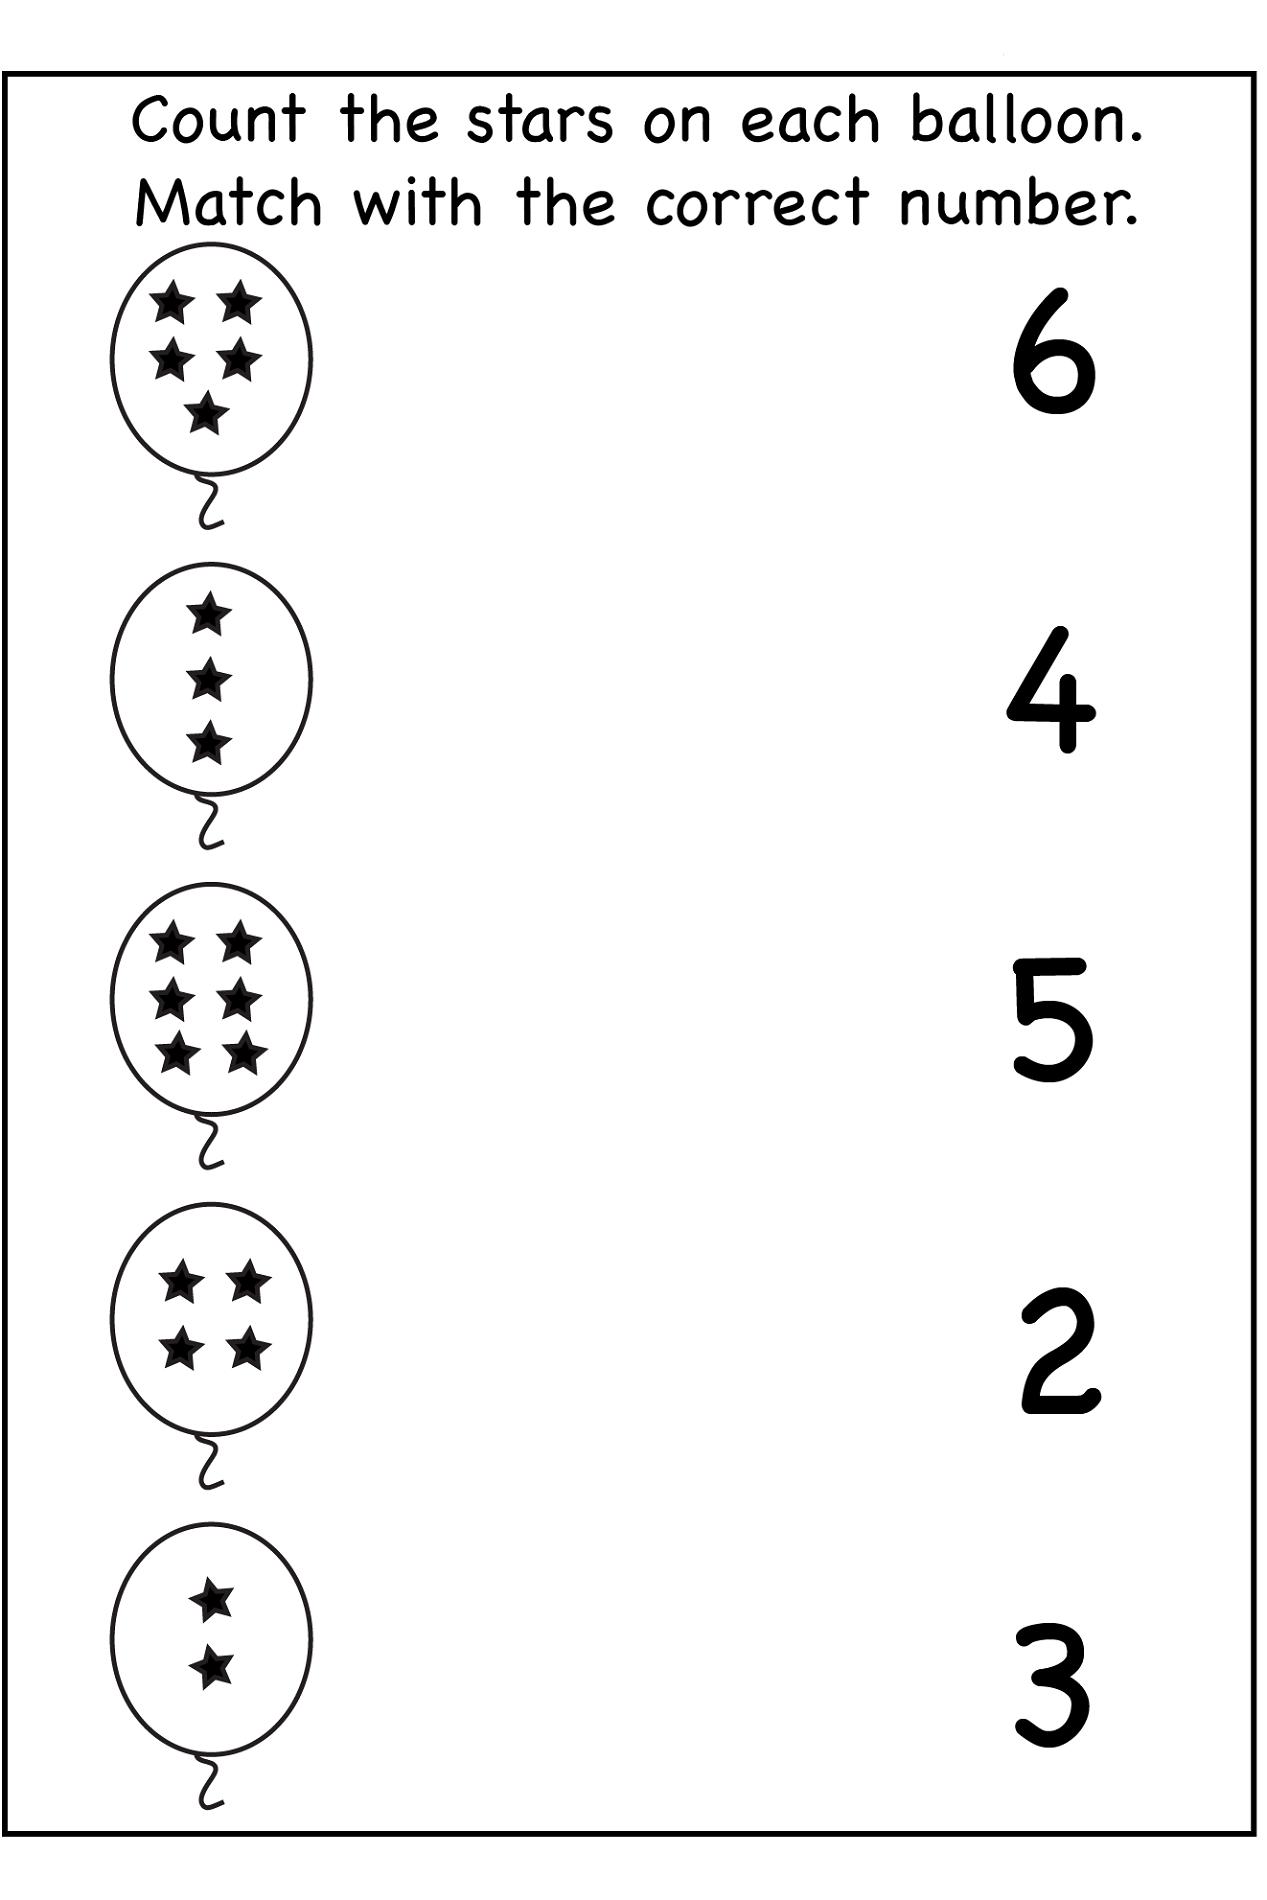 Pre-K Worksheets - Yahoo Image Search Results | Preschool